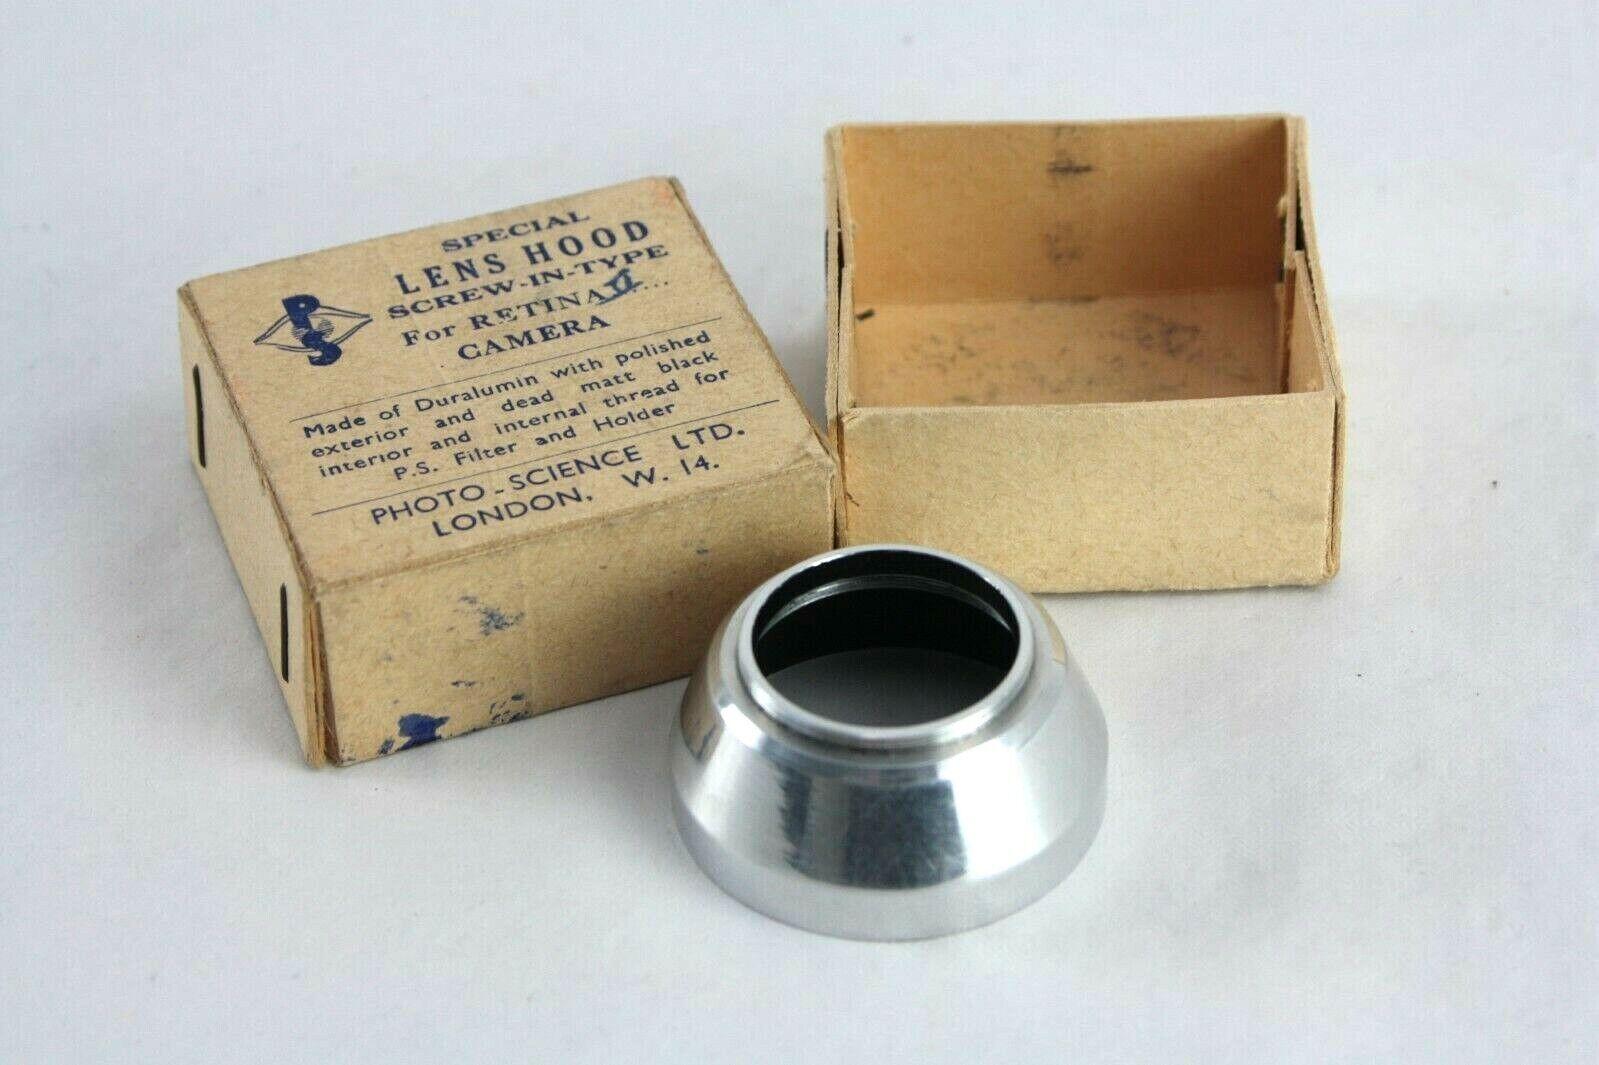 Vintage PHOTO SCIENCE DURALUMIN LENS HOOD for Kodak Retina II Camera, boxed